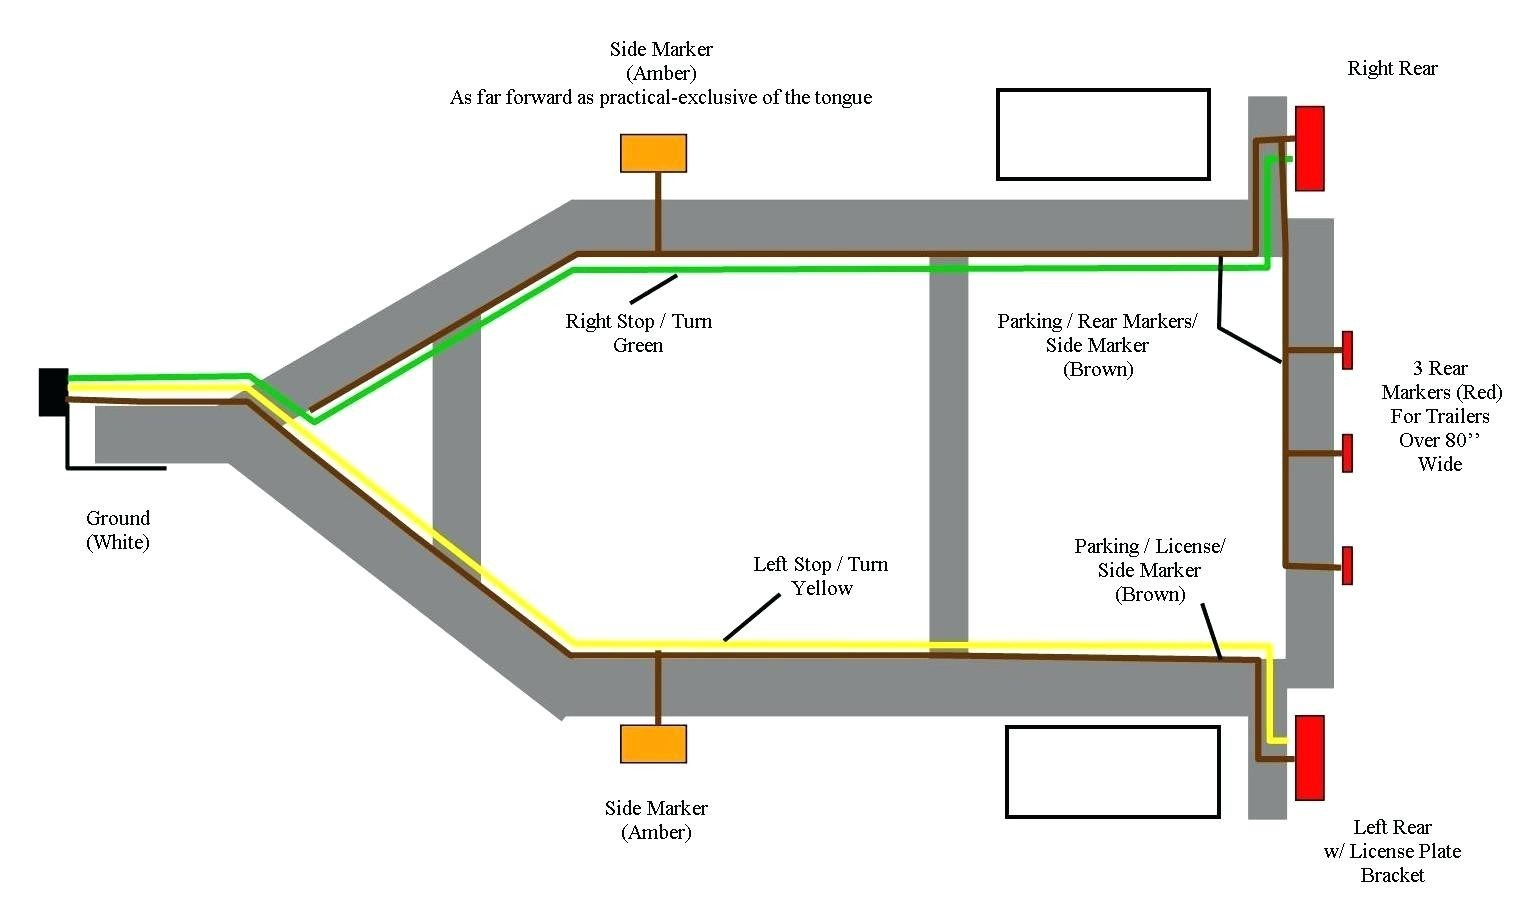 Emergency Lighting Wiring Diagram - Democraciaejustica - Blazer Trailer Lights Wiring Diagram